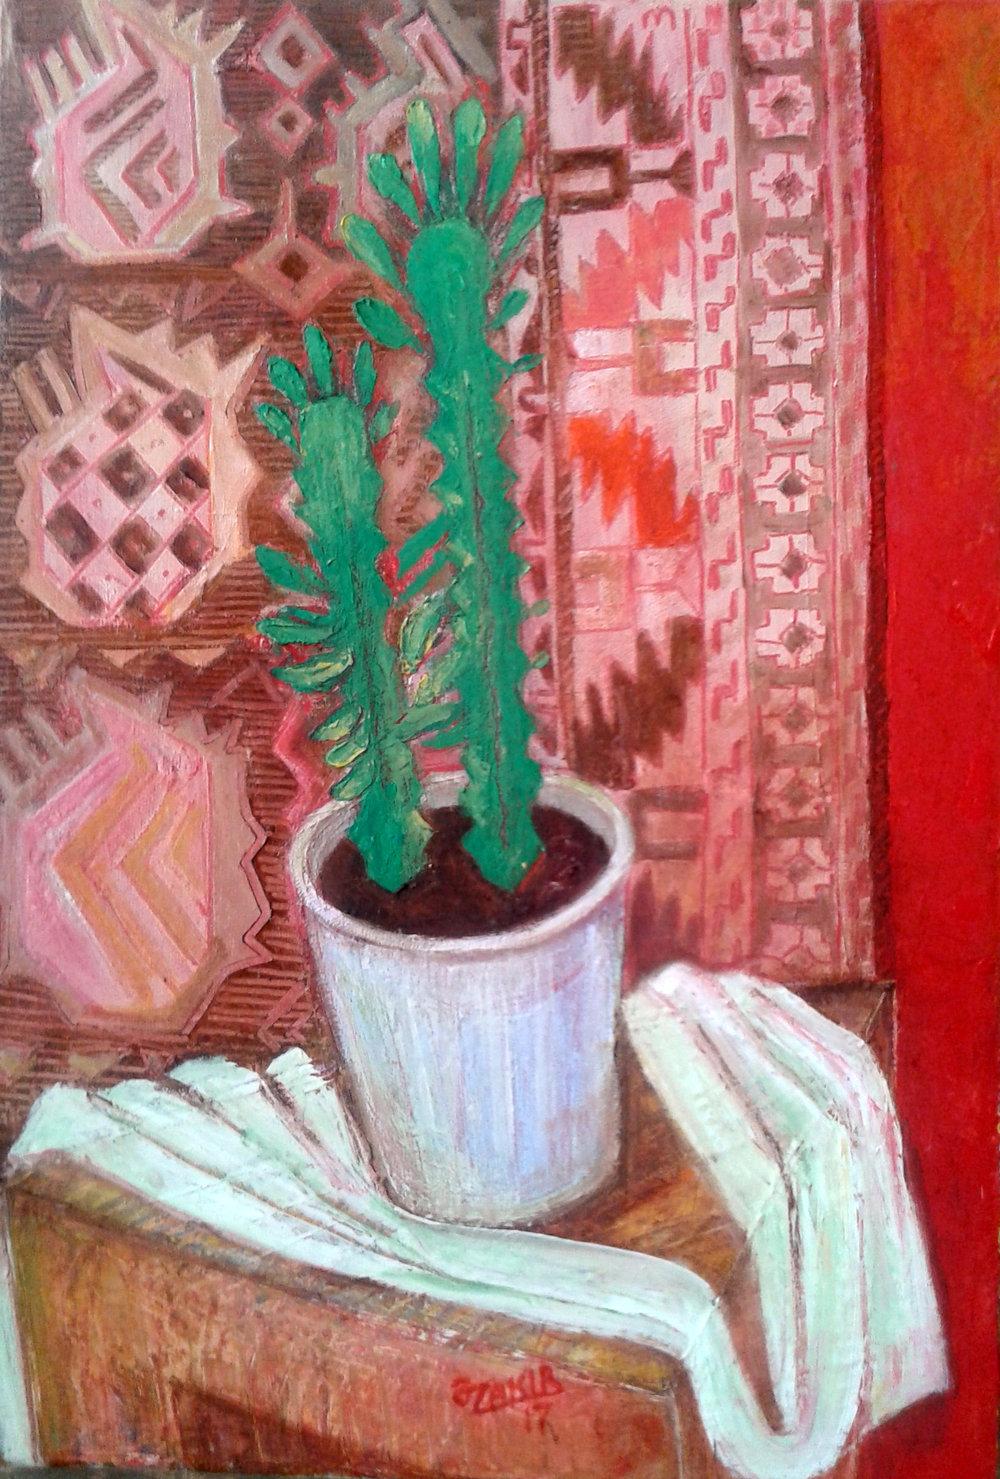 36.Cactus.2017 year  Original Painting Oil on Canvas 50 x 35 cm.1500$.jpg